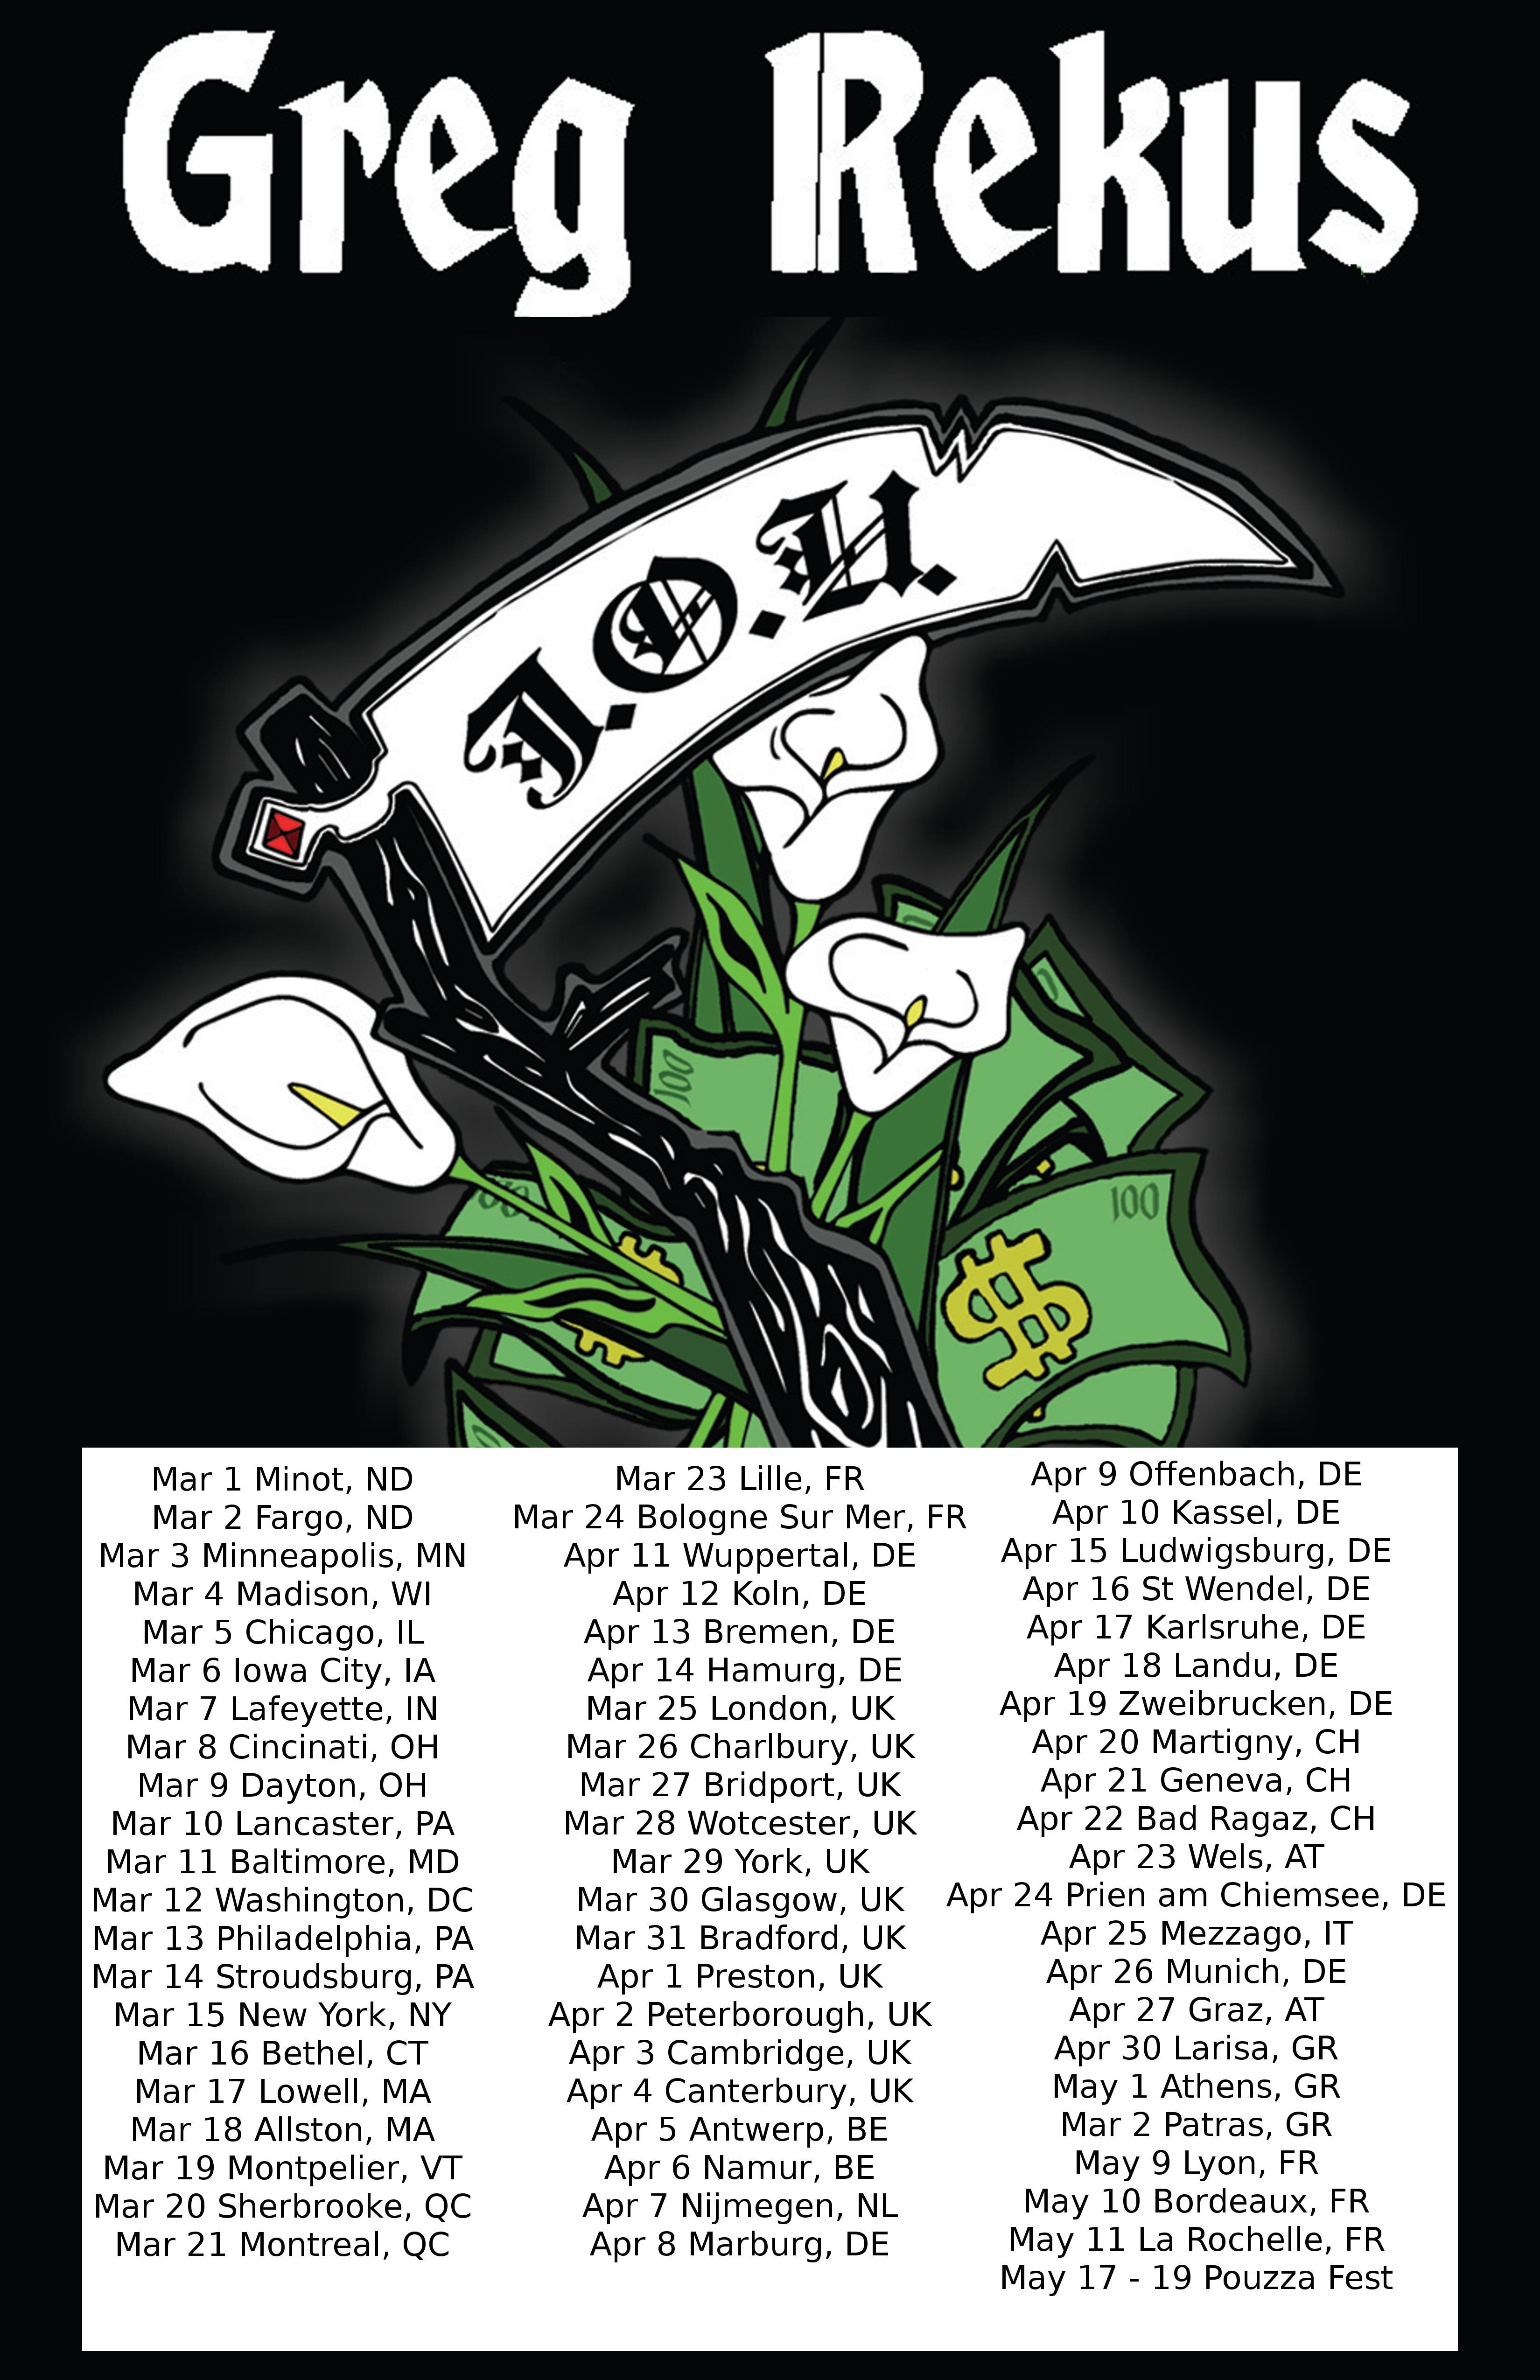 Greg Rekus - Tour Dates